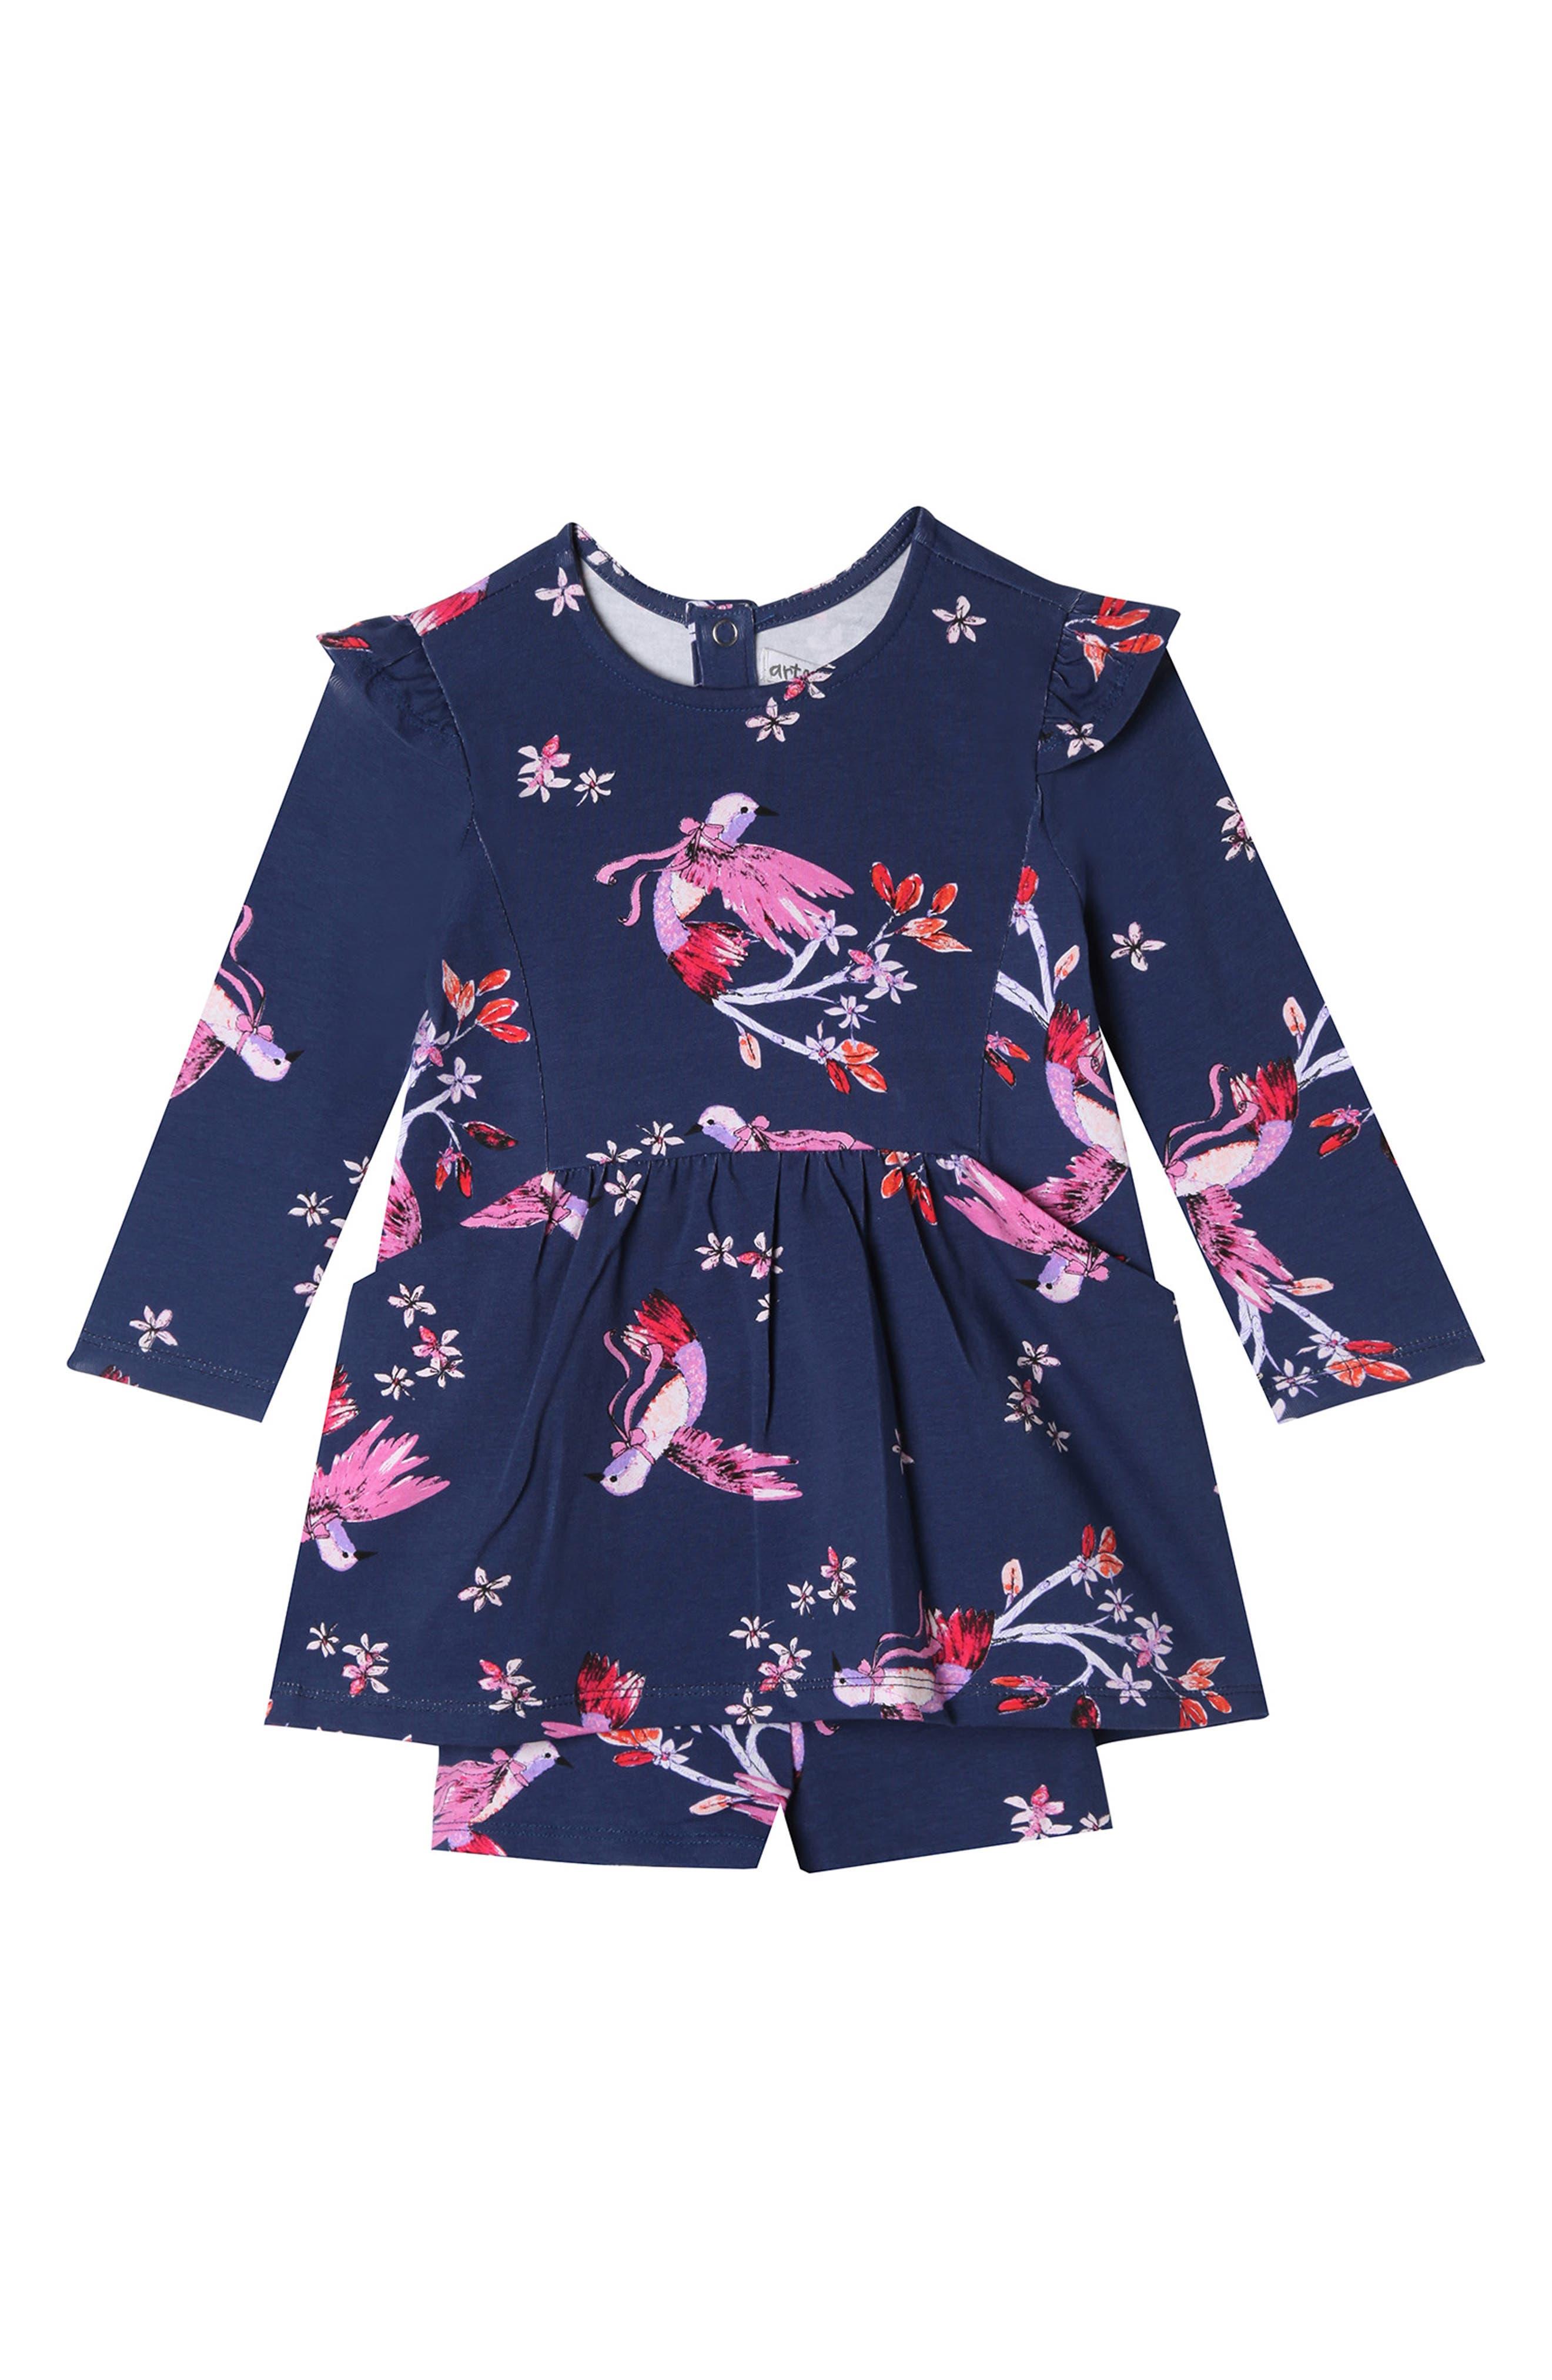 Leah Swallow Dress & Shorts Set,                         Main,                         color, SWALLOW